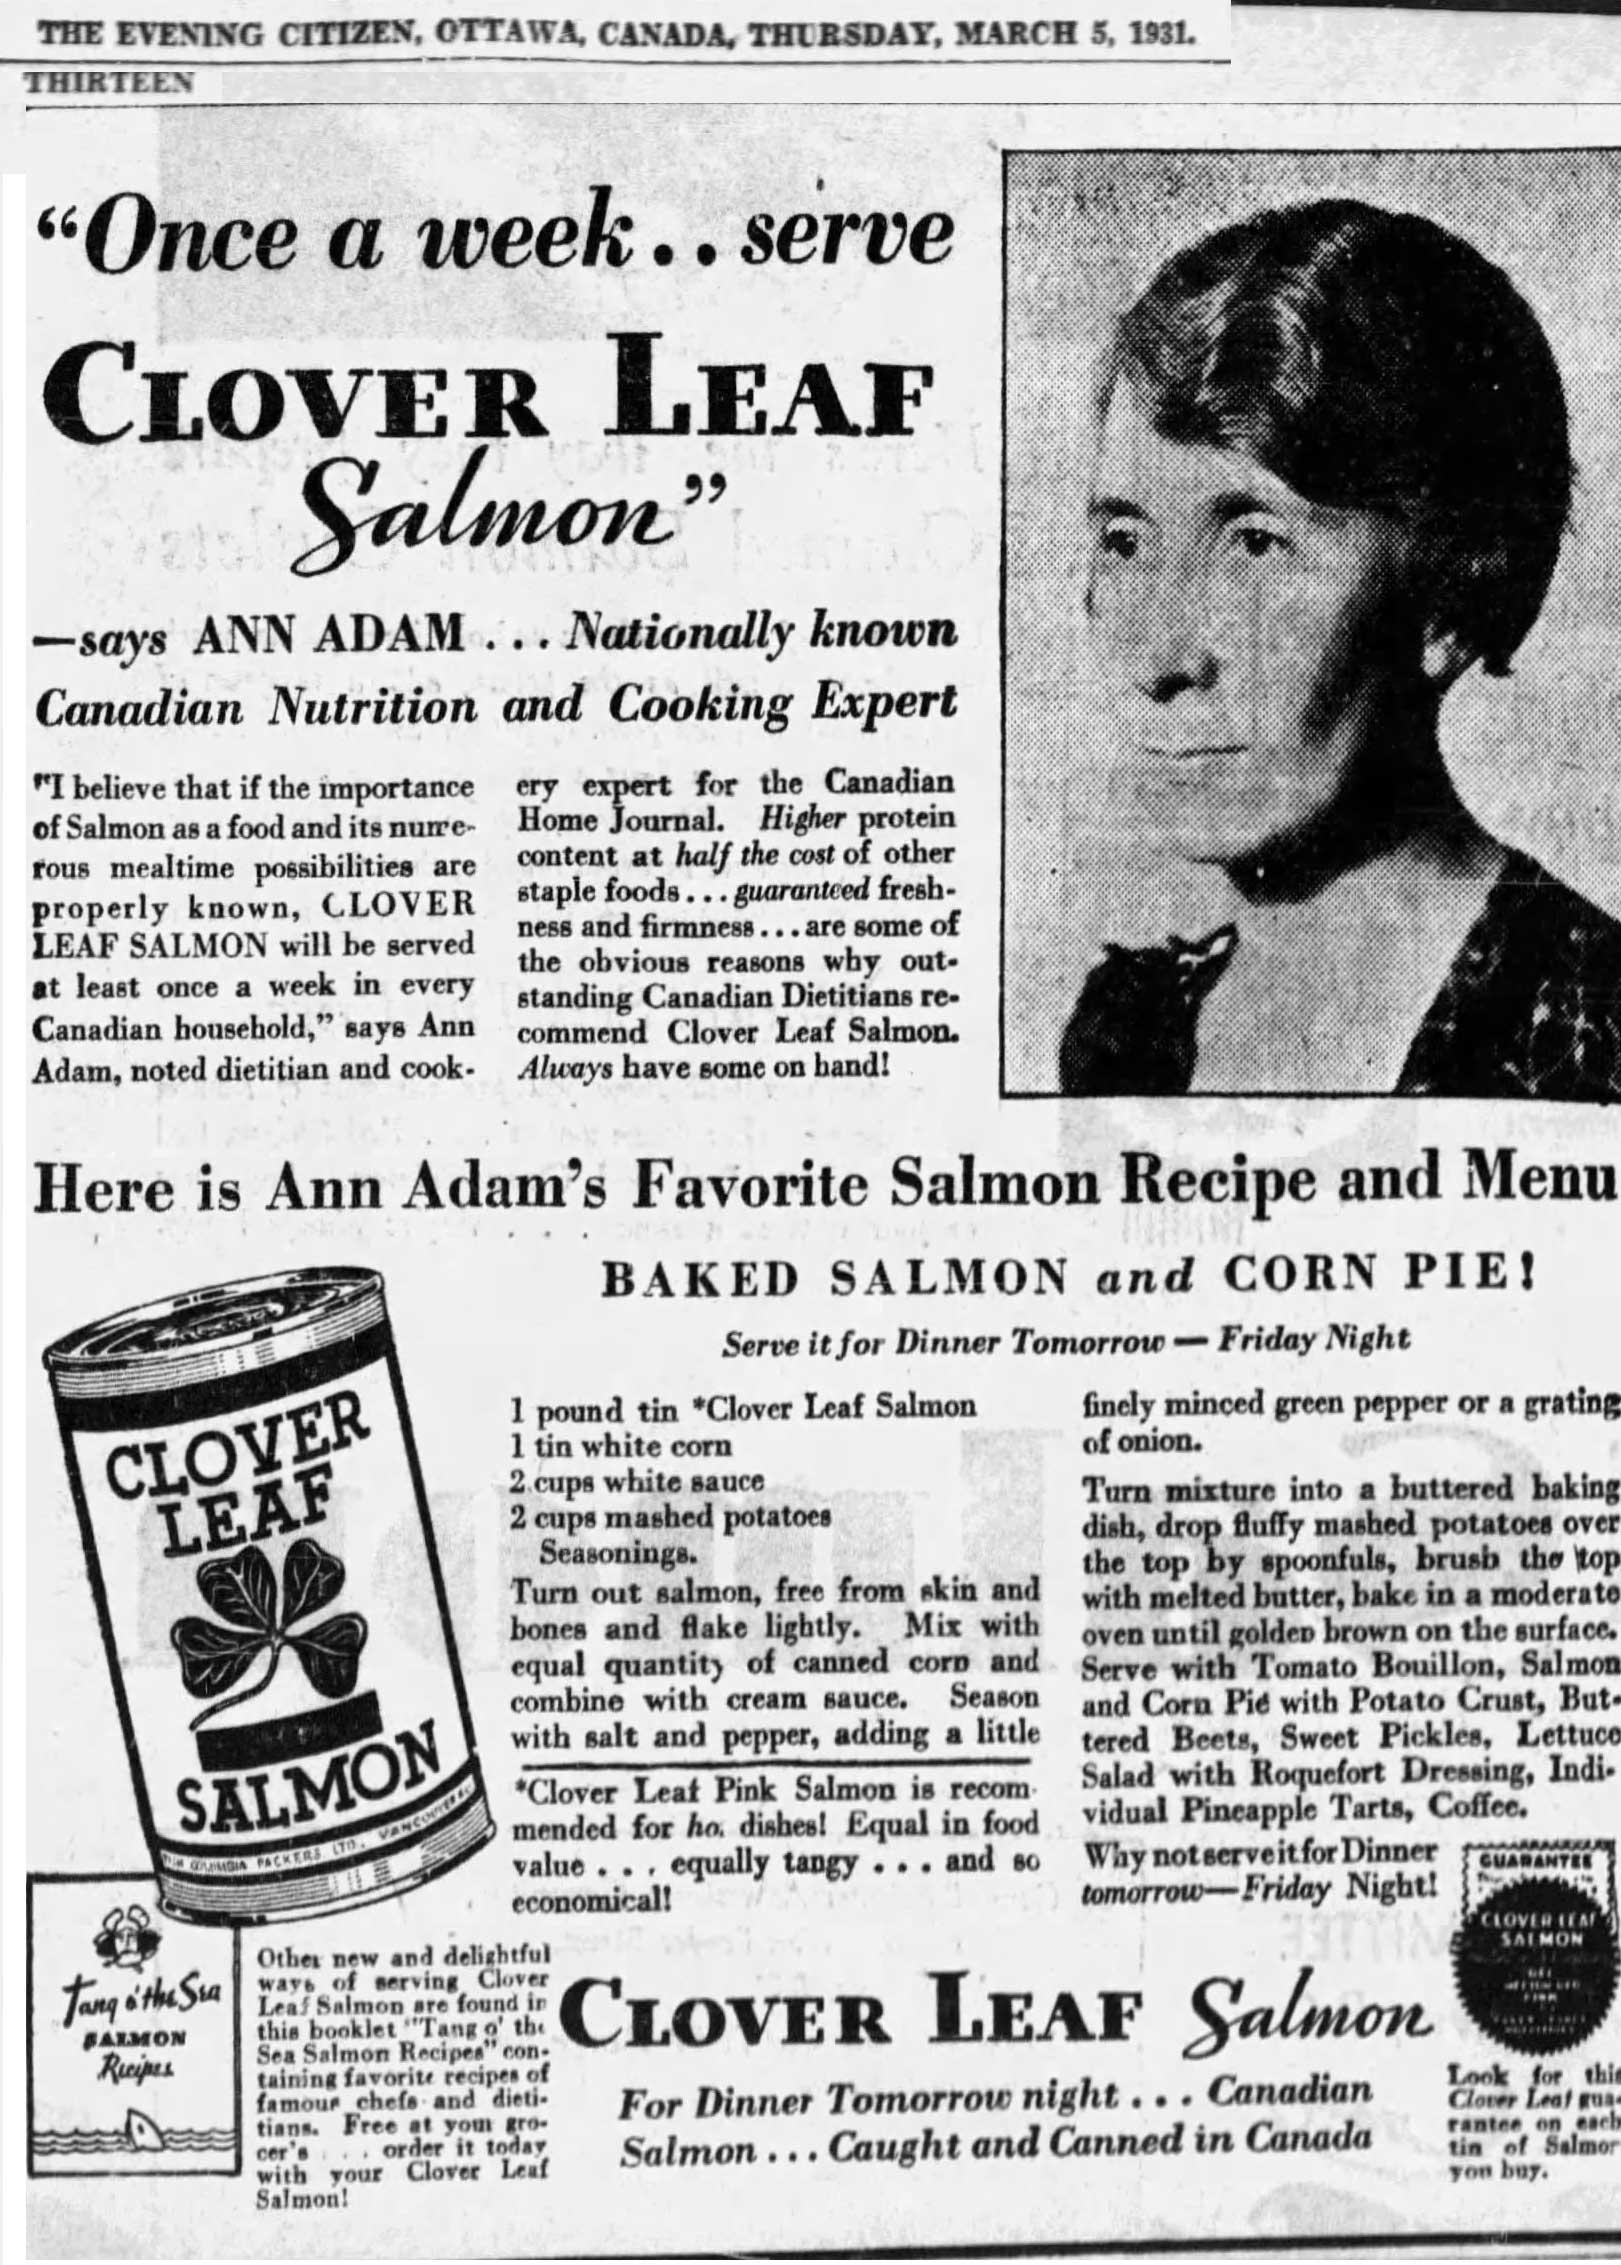 A 1931 product endorsement under the name Ann Adam